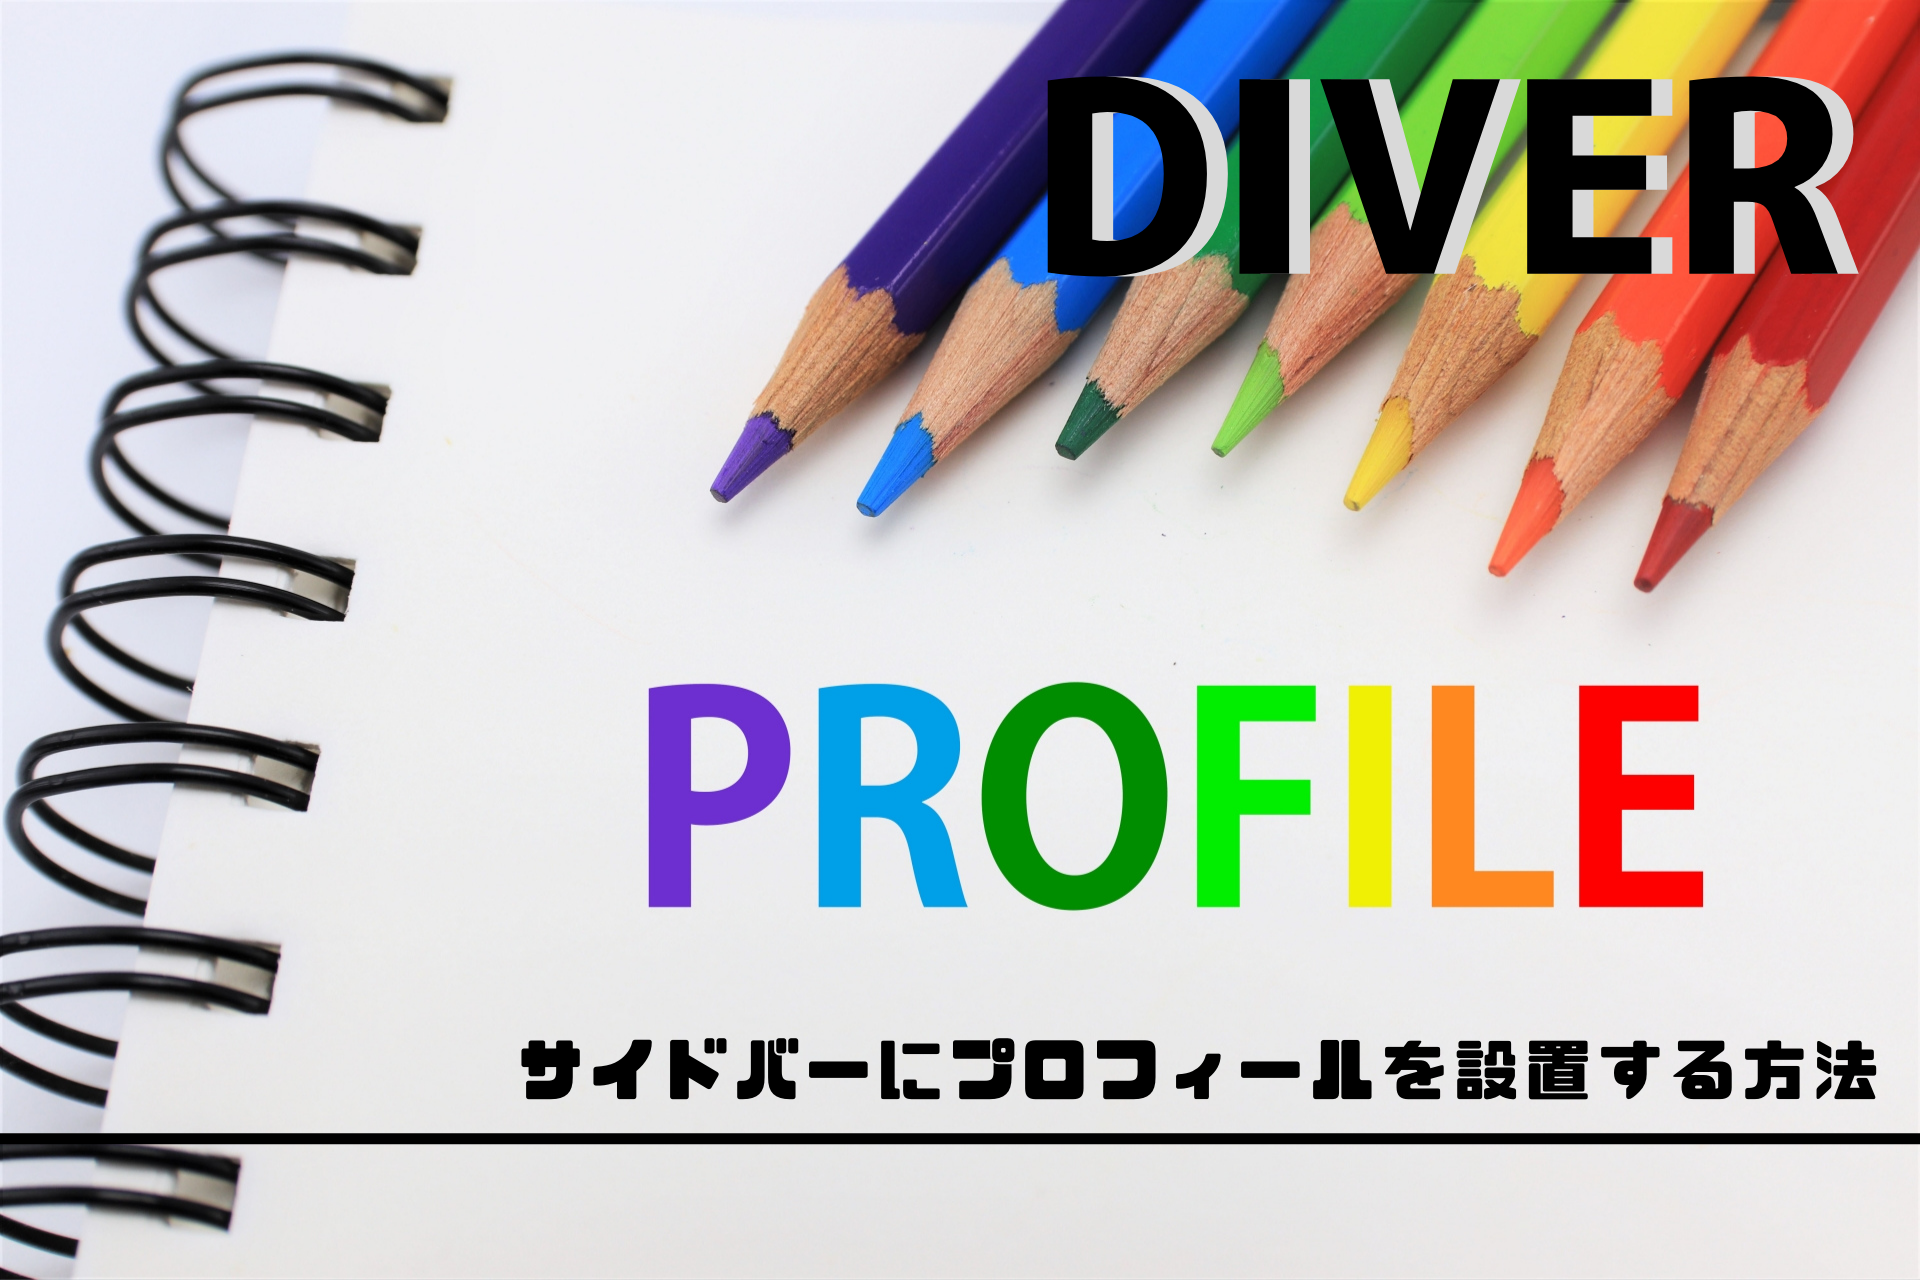 【Diver】ワードプレスでサイドバーにプロフィールを設置する方法